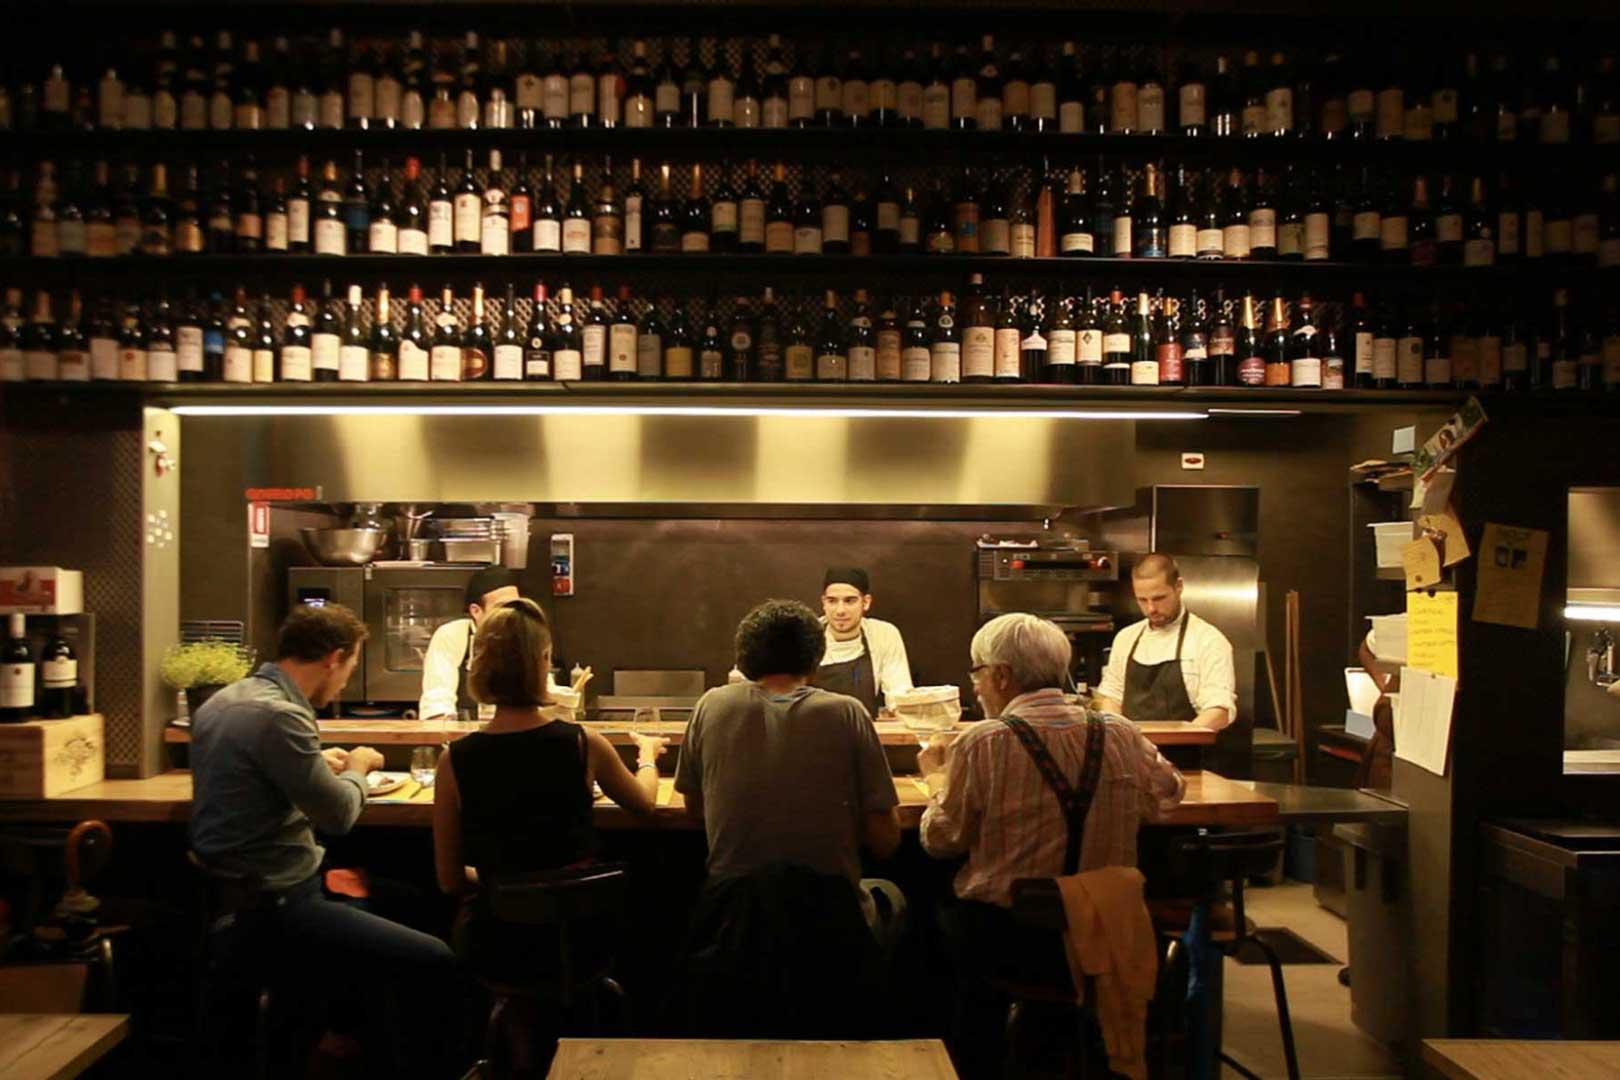 I migliori cocktail bar di milano flawless milano for Bar 35 food drinks milano